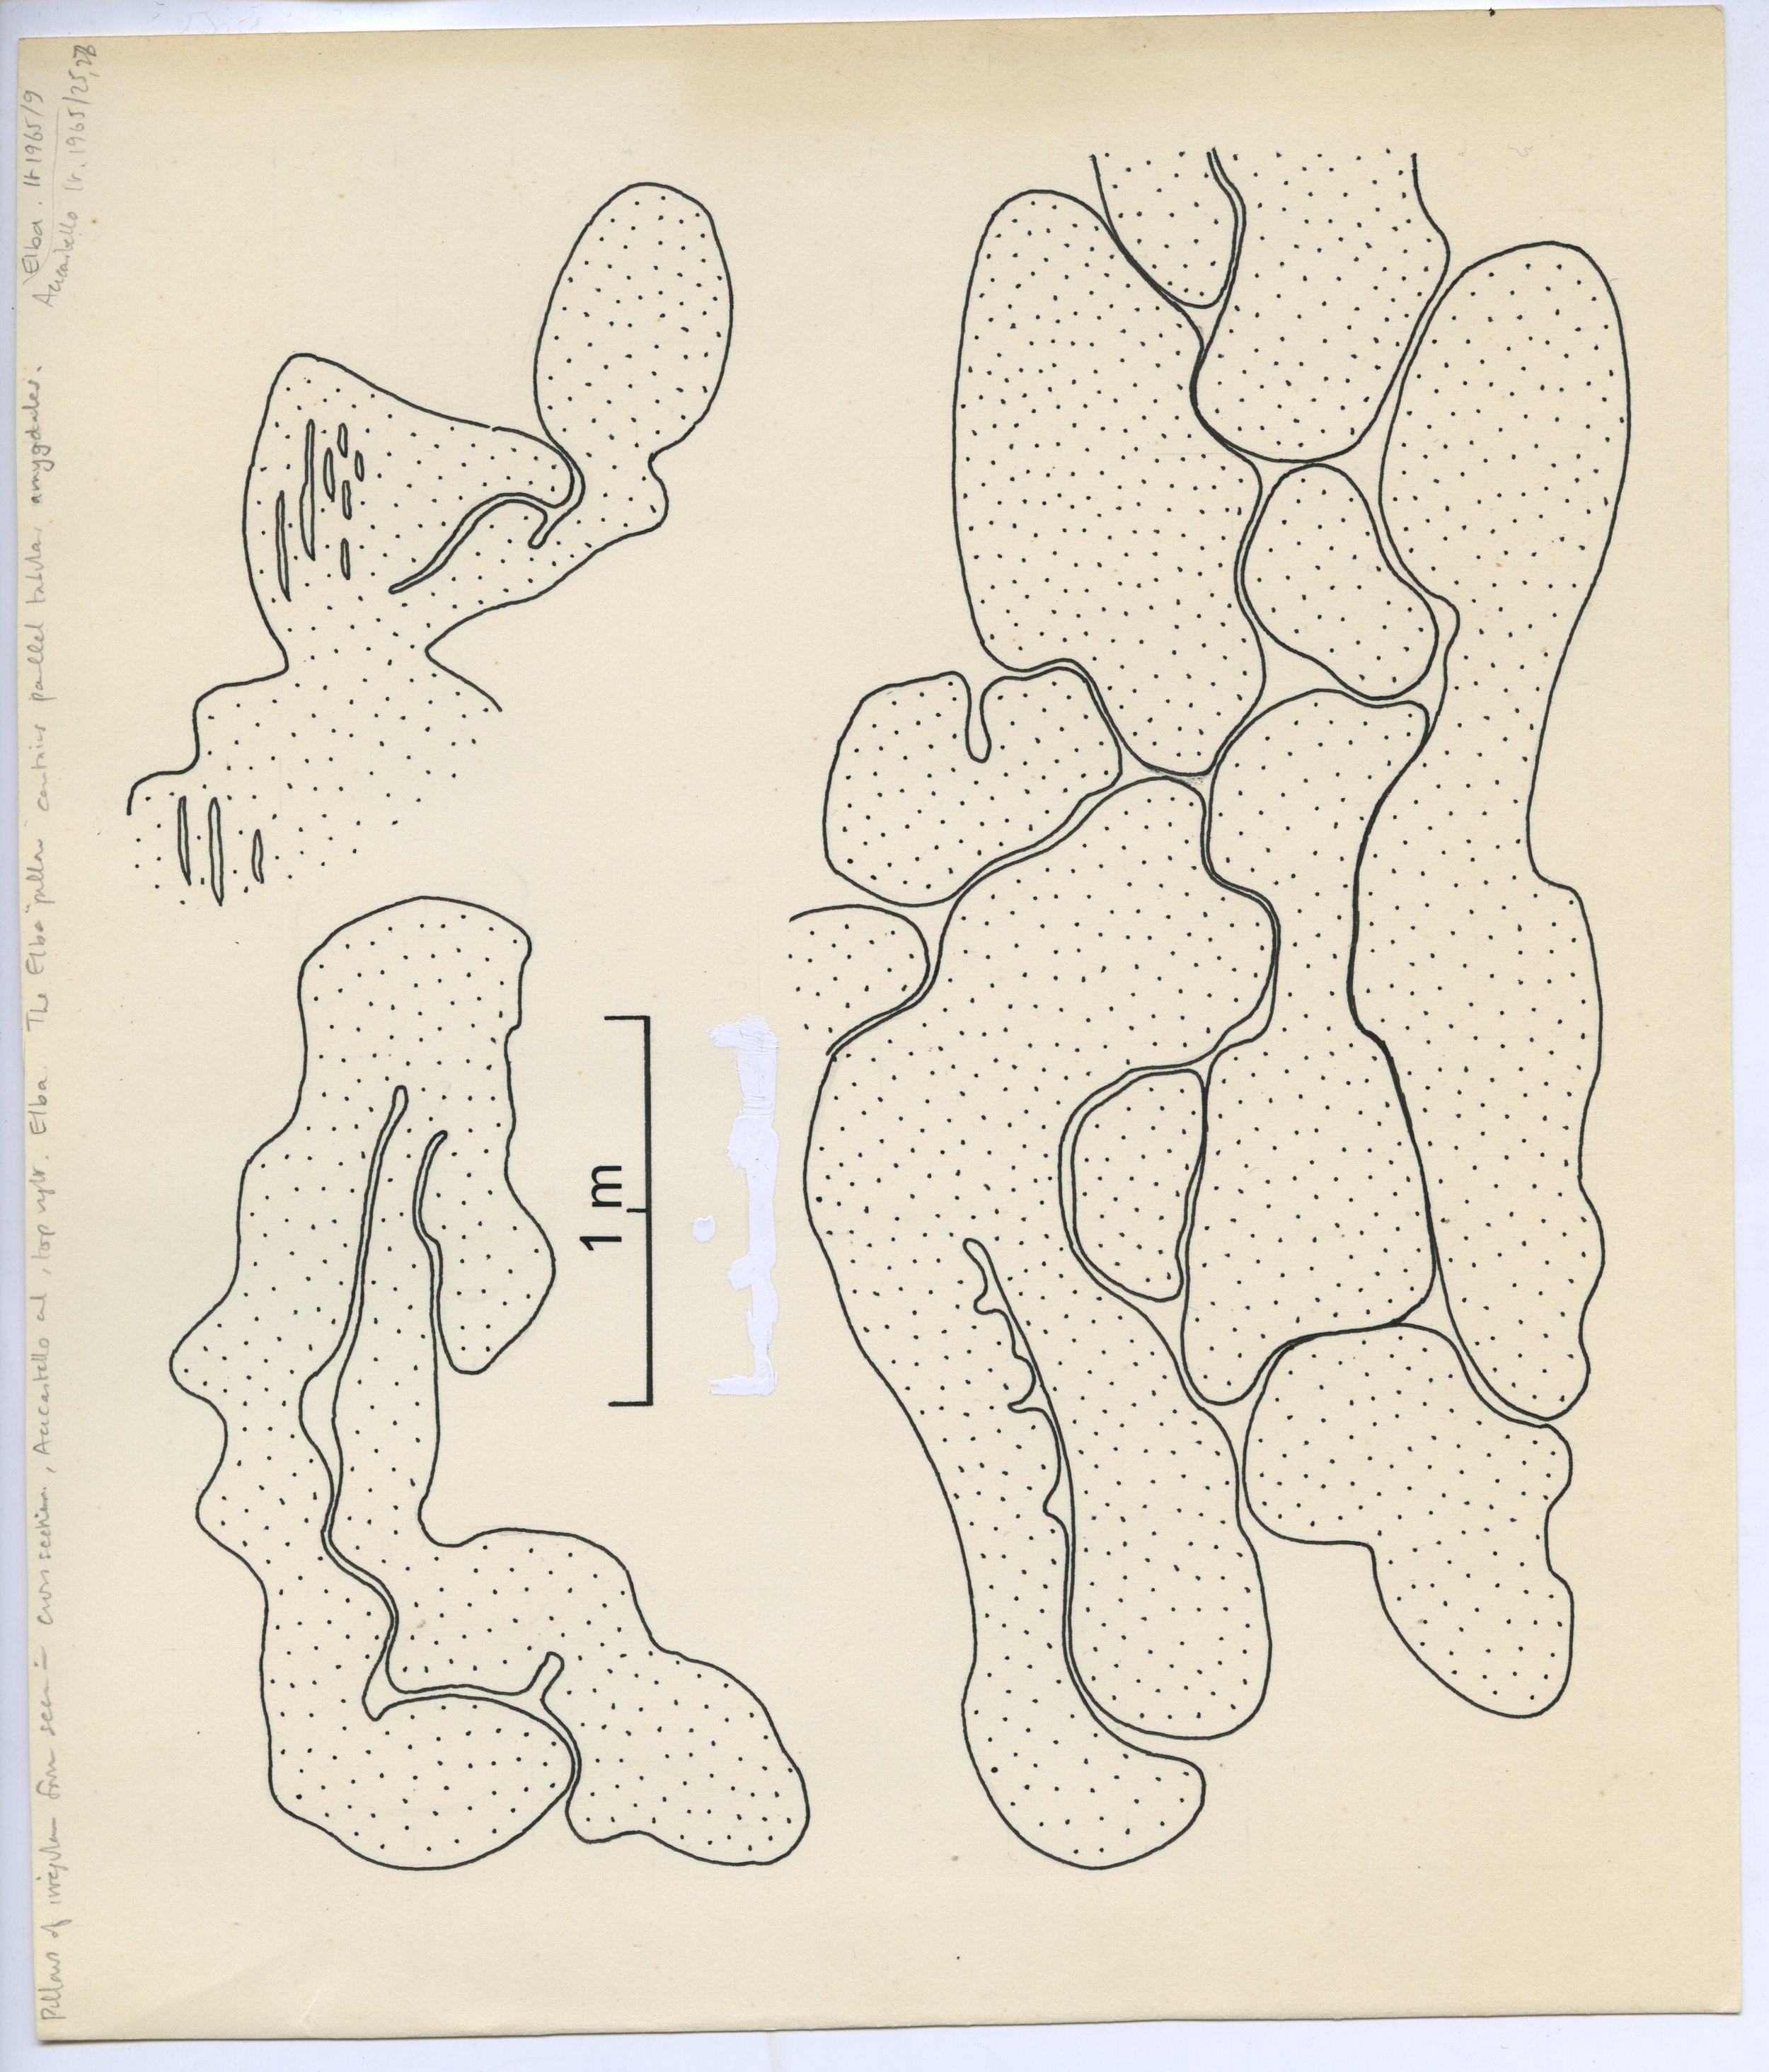 aciacastello chp8 'illustrations' 1.jpeg